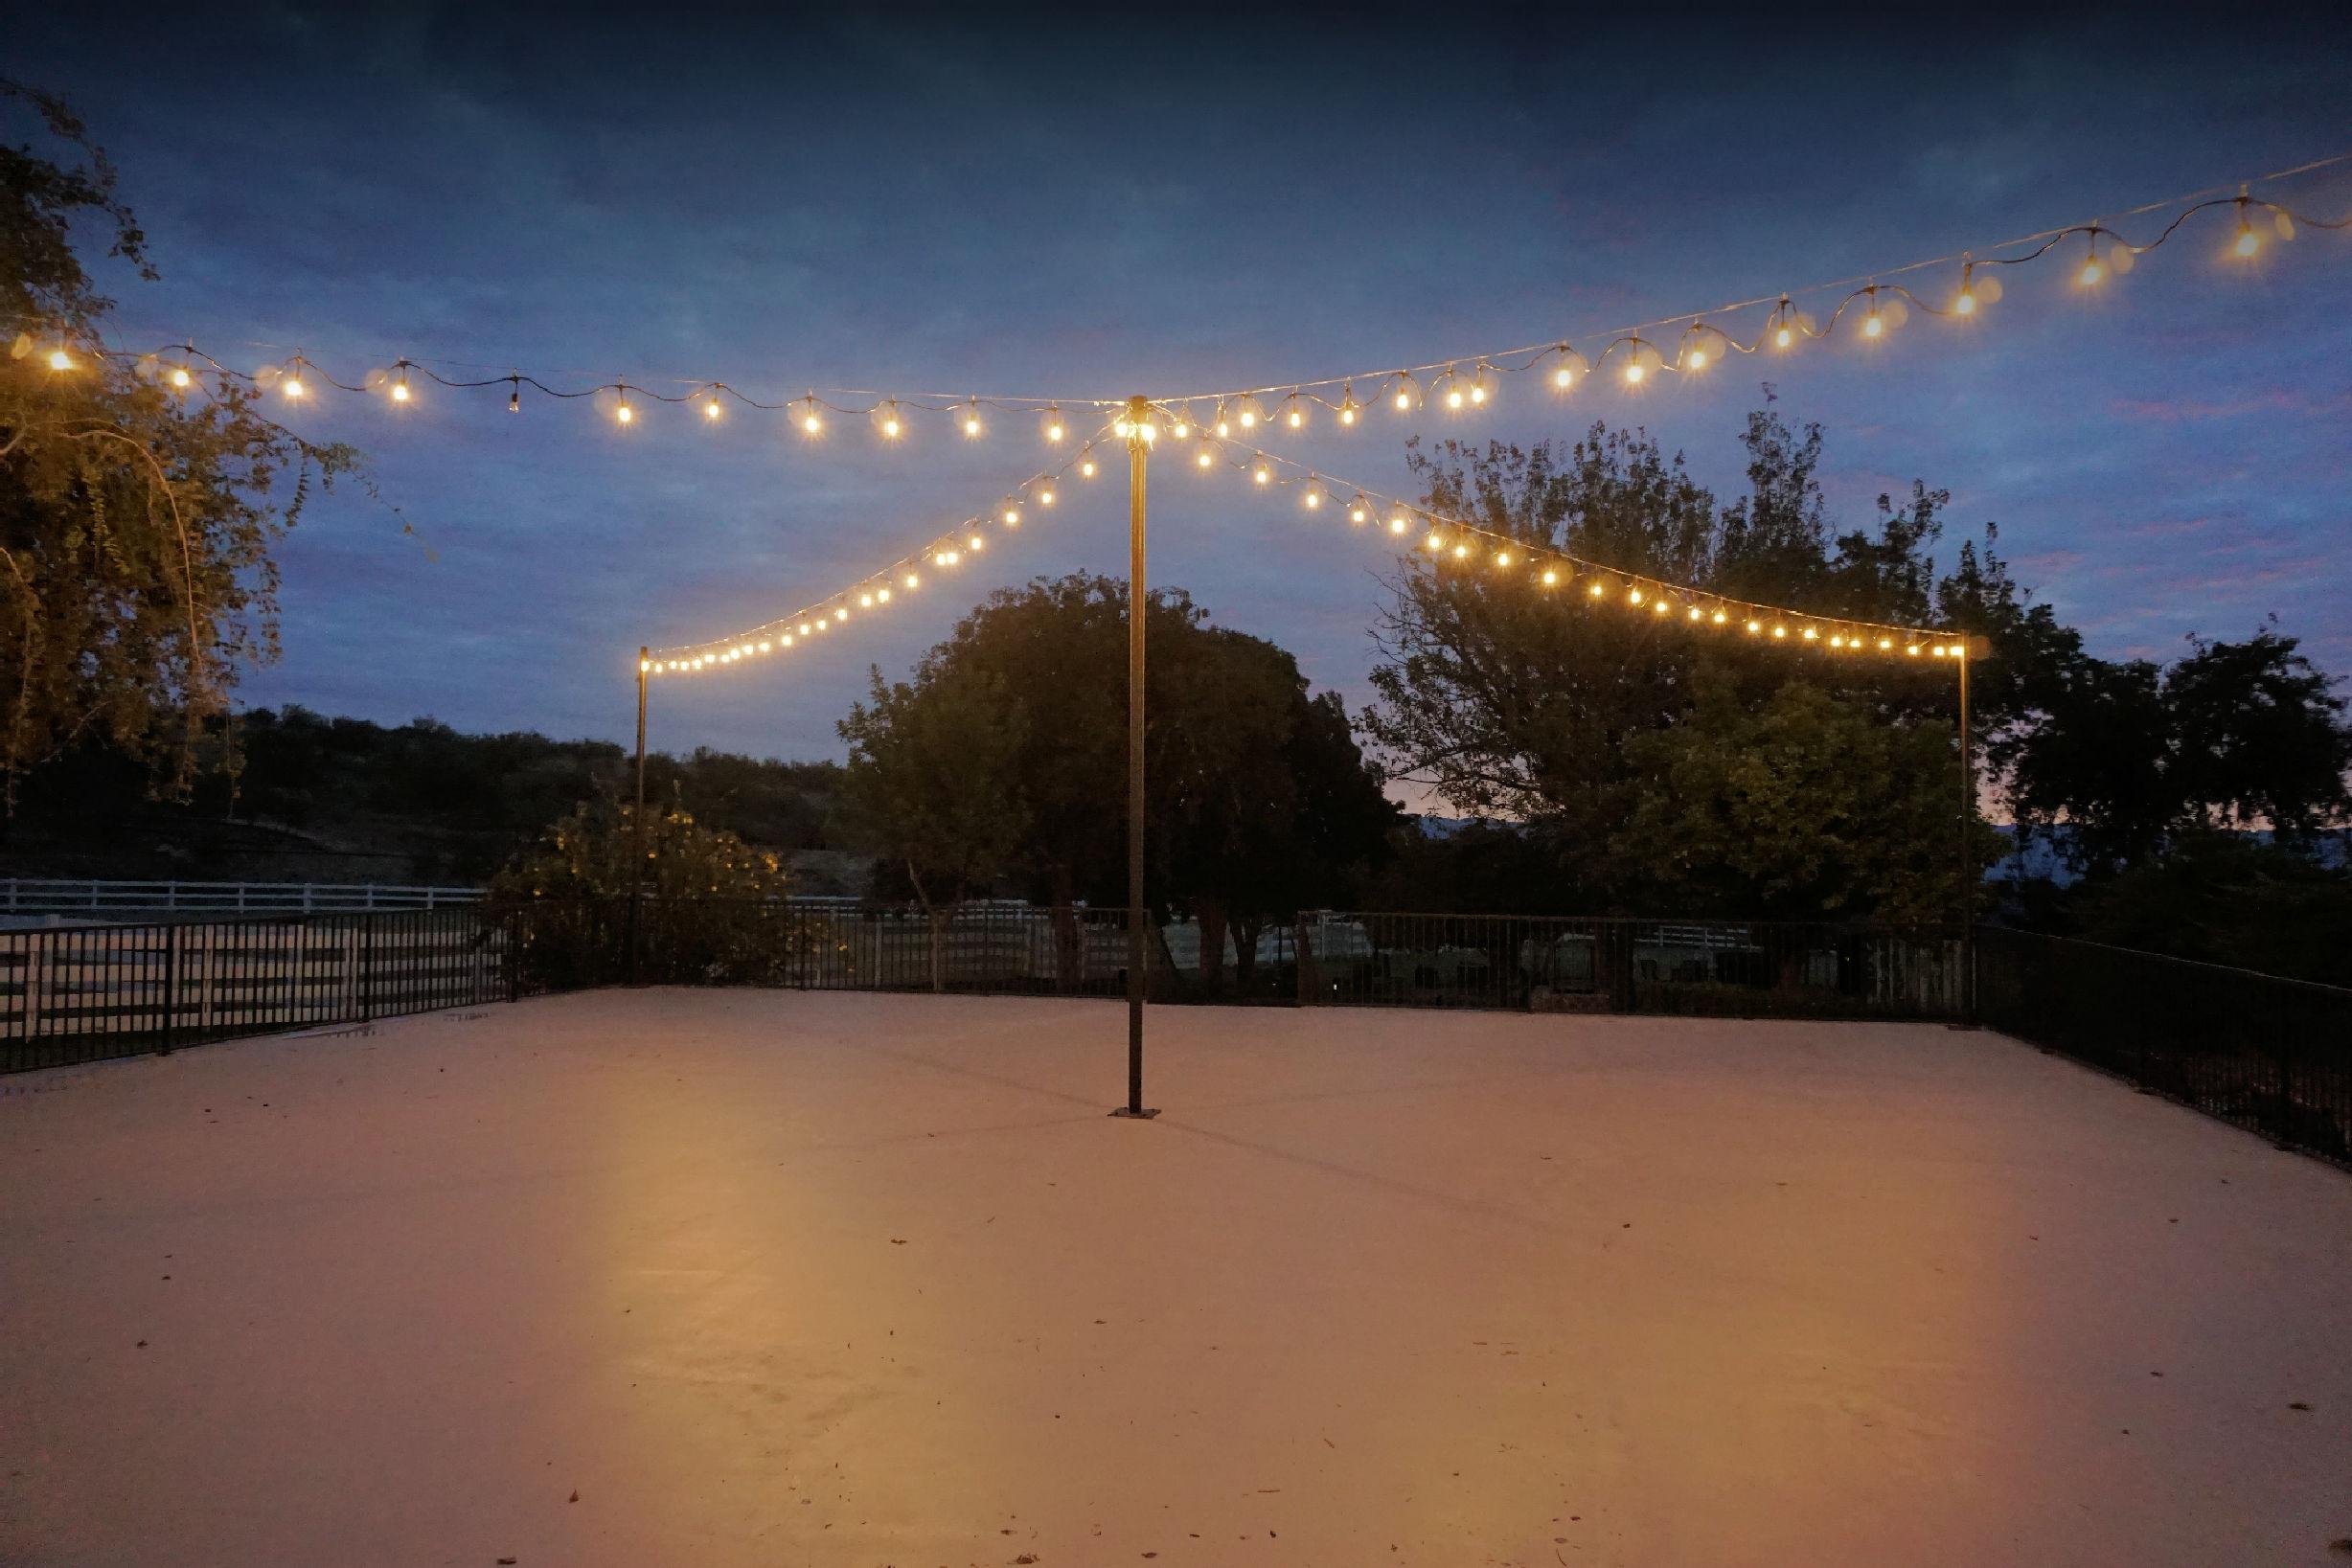 Dance floor glow from lights early morning.jpg